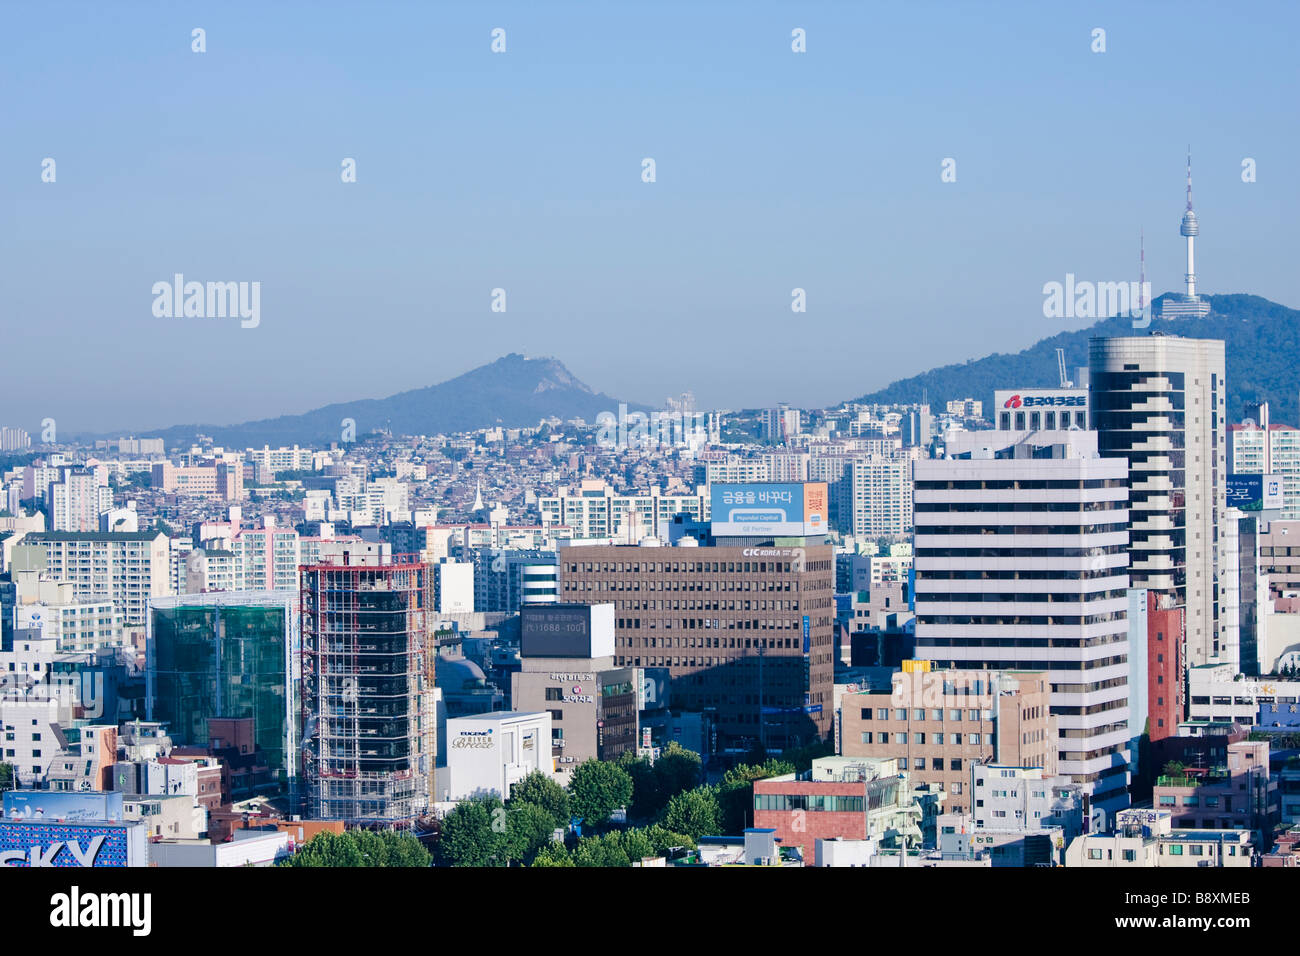 Downtown Seoul, South Korea - Stock Image